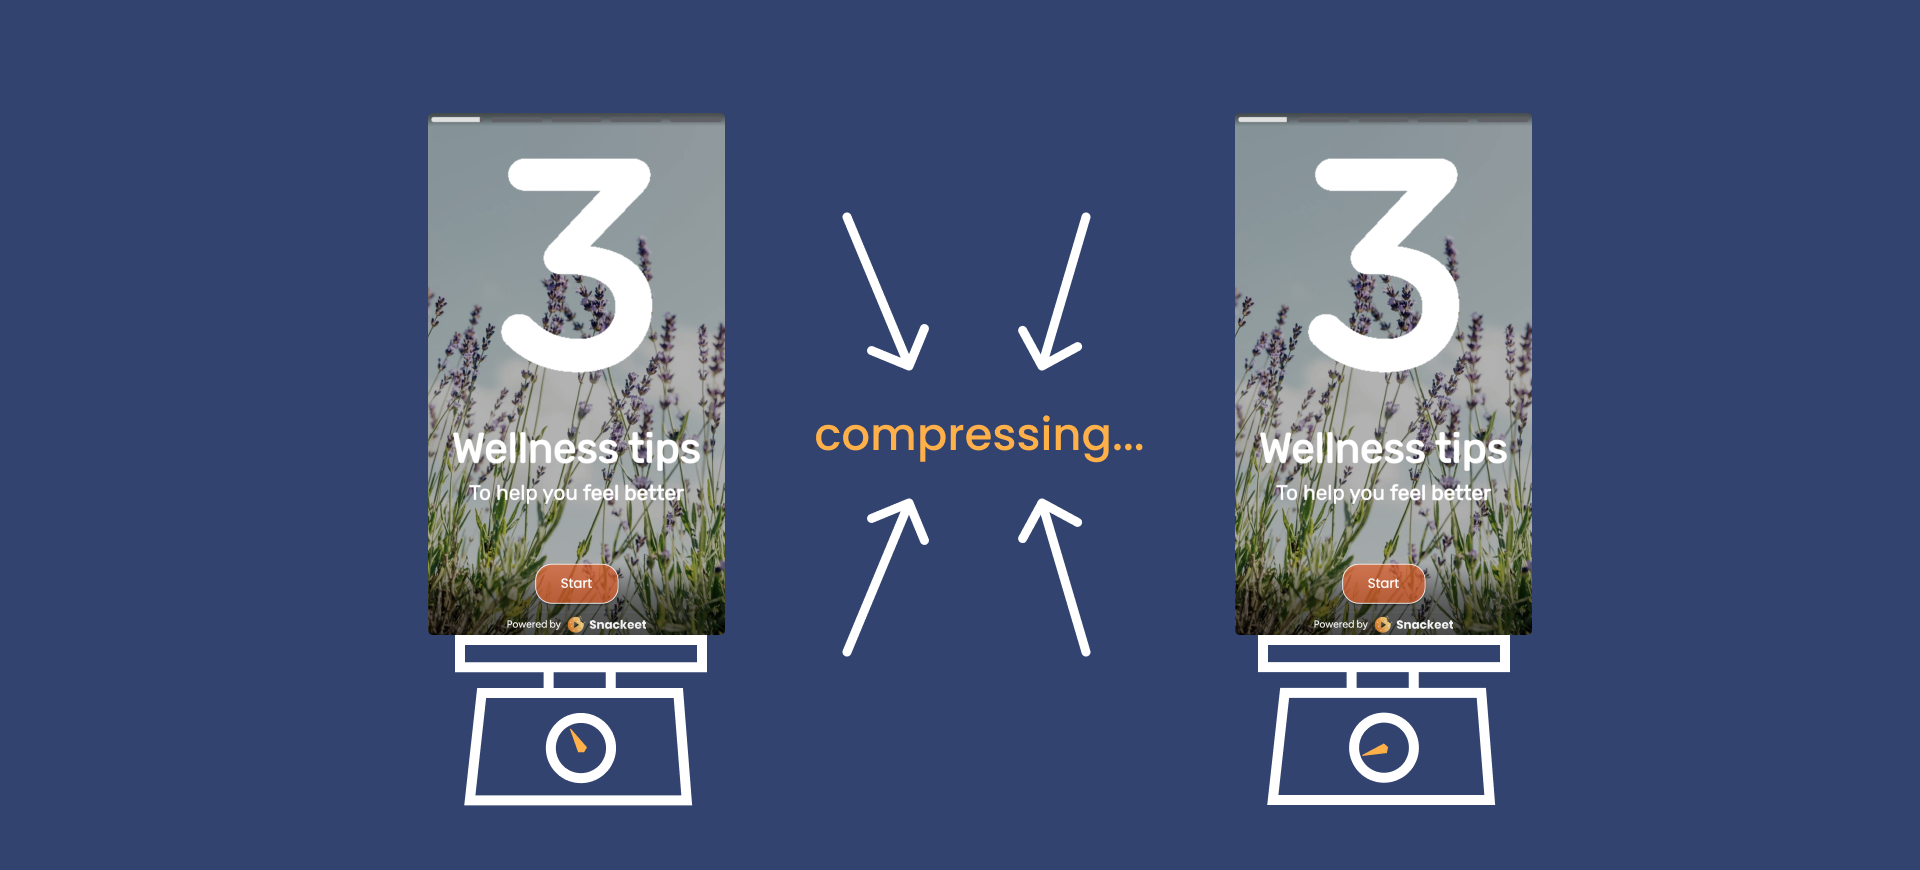 Compression du contenu multimédia